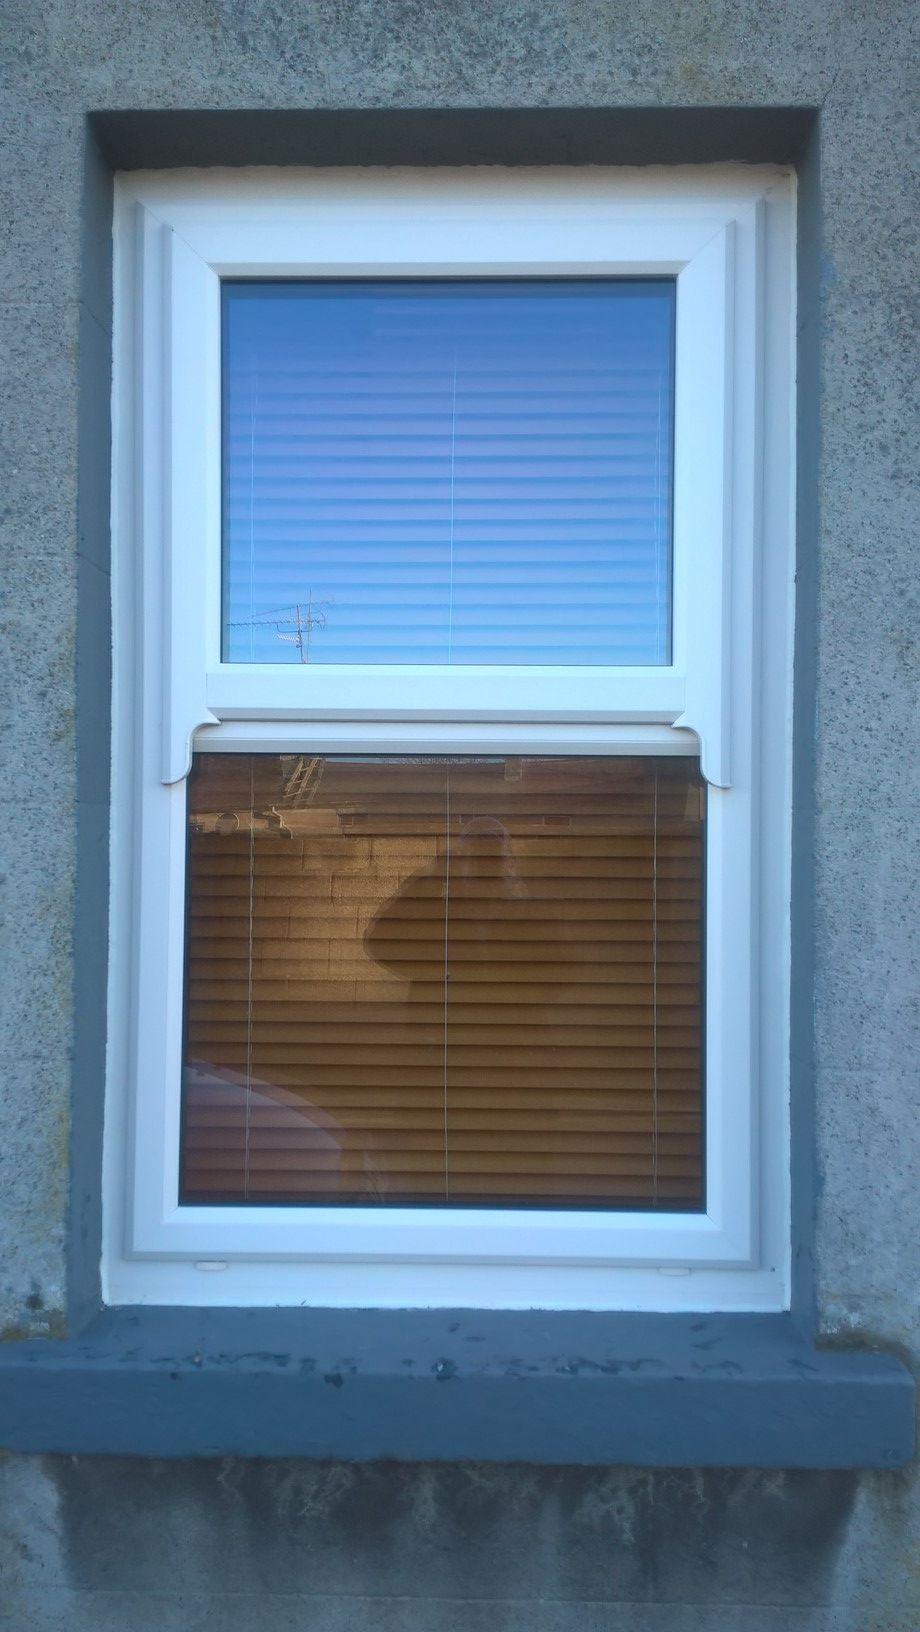 Pvc Mock Sash Window In White Windows Exterior Windows Window Projects